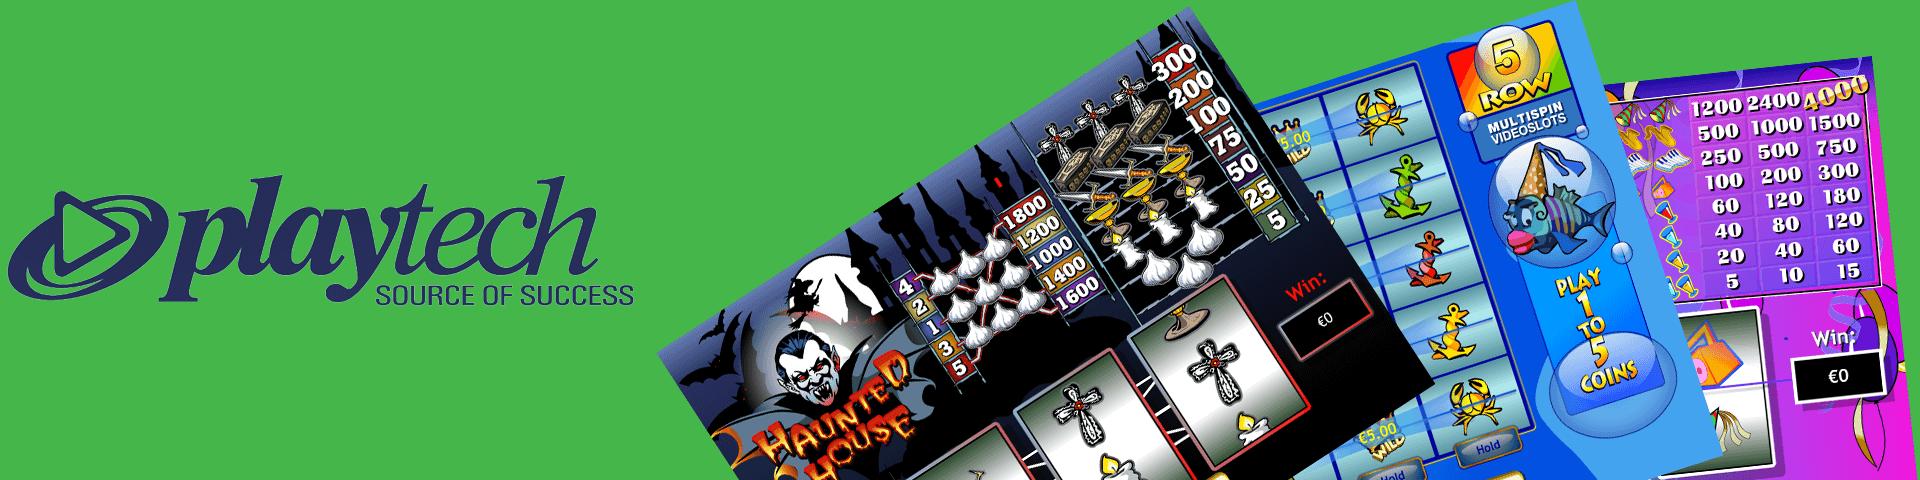 jocuri-casino-Playtech-multabafta-slider